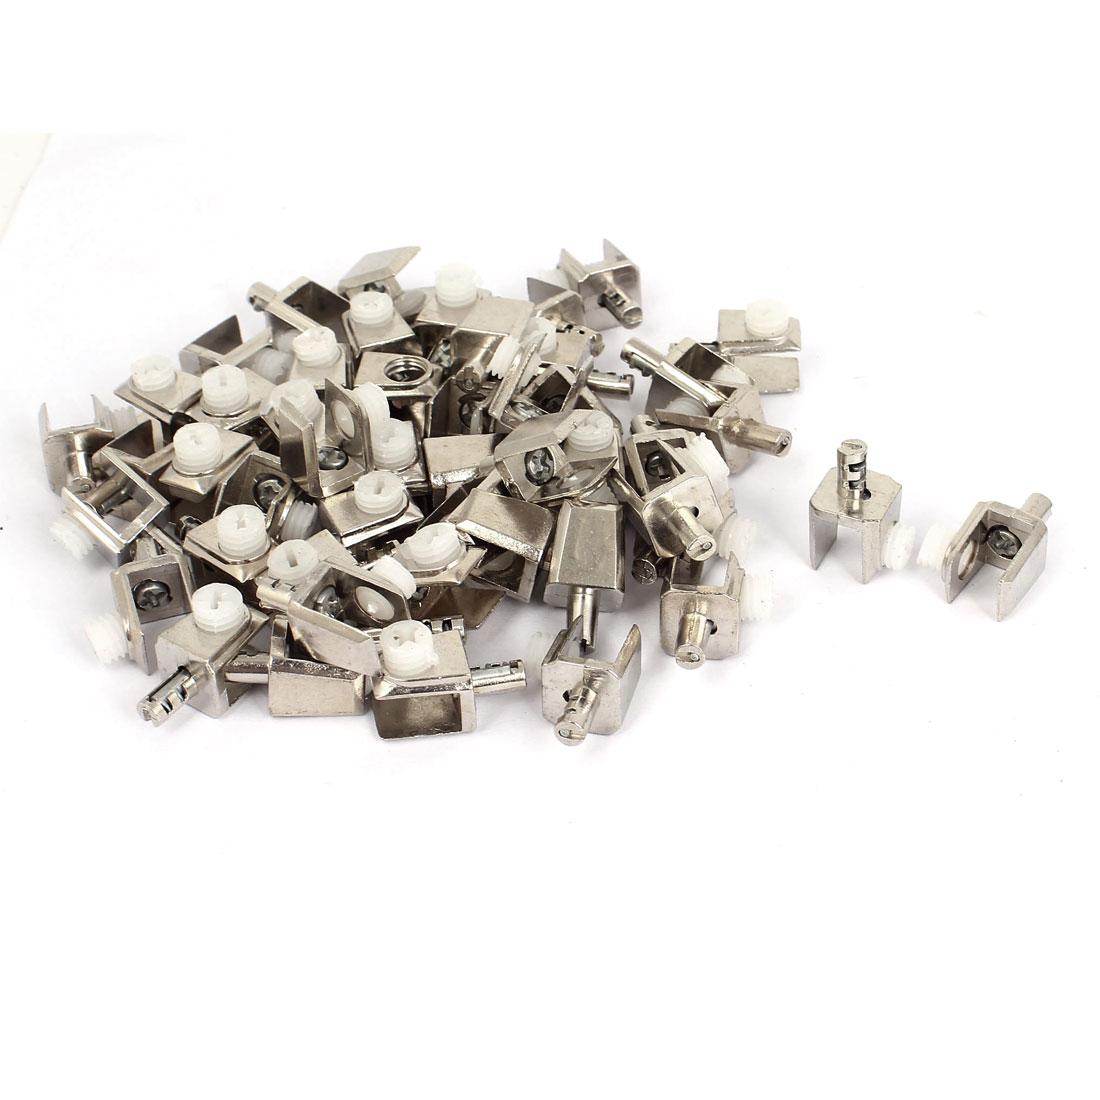 5mm-8mm Thickness Adjustable Screw Zinc Alloy Glass Clip Clamp 50 Pcs